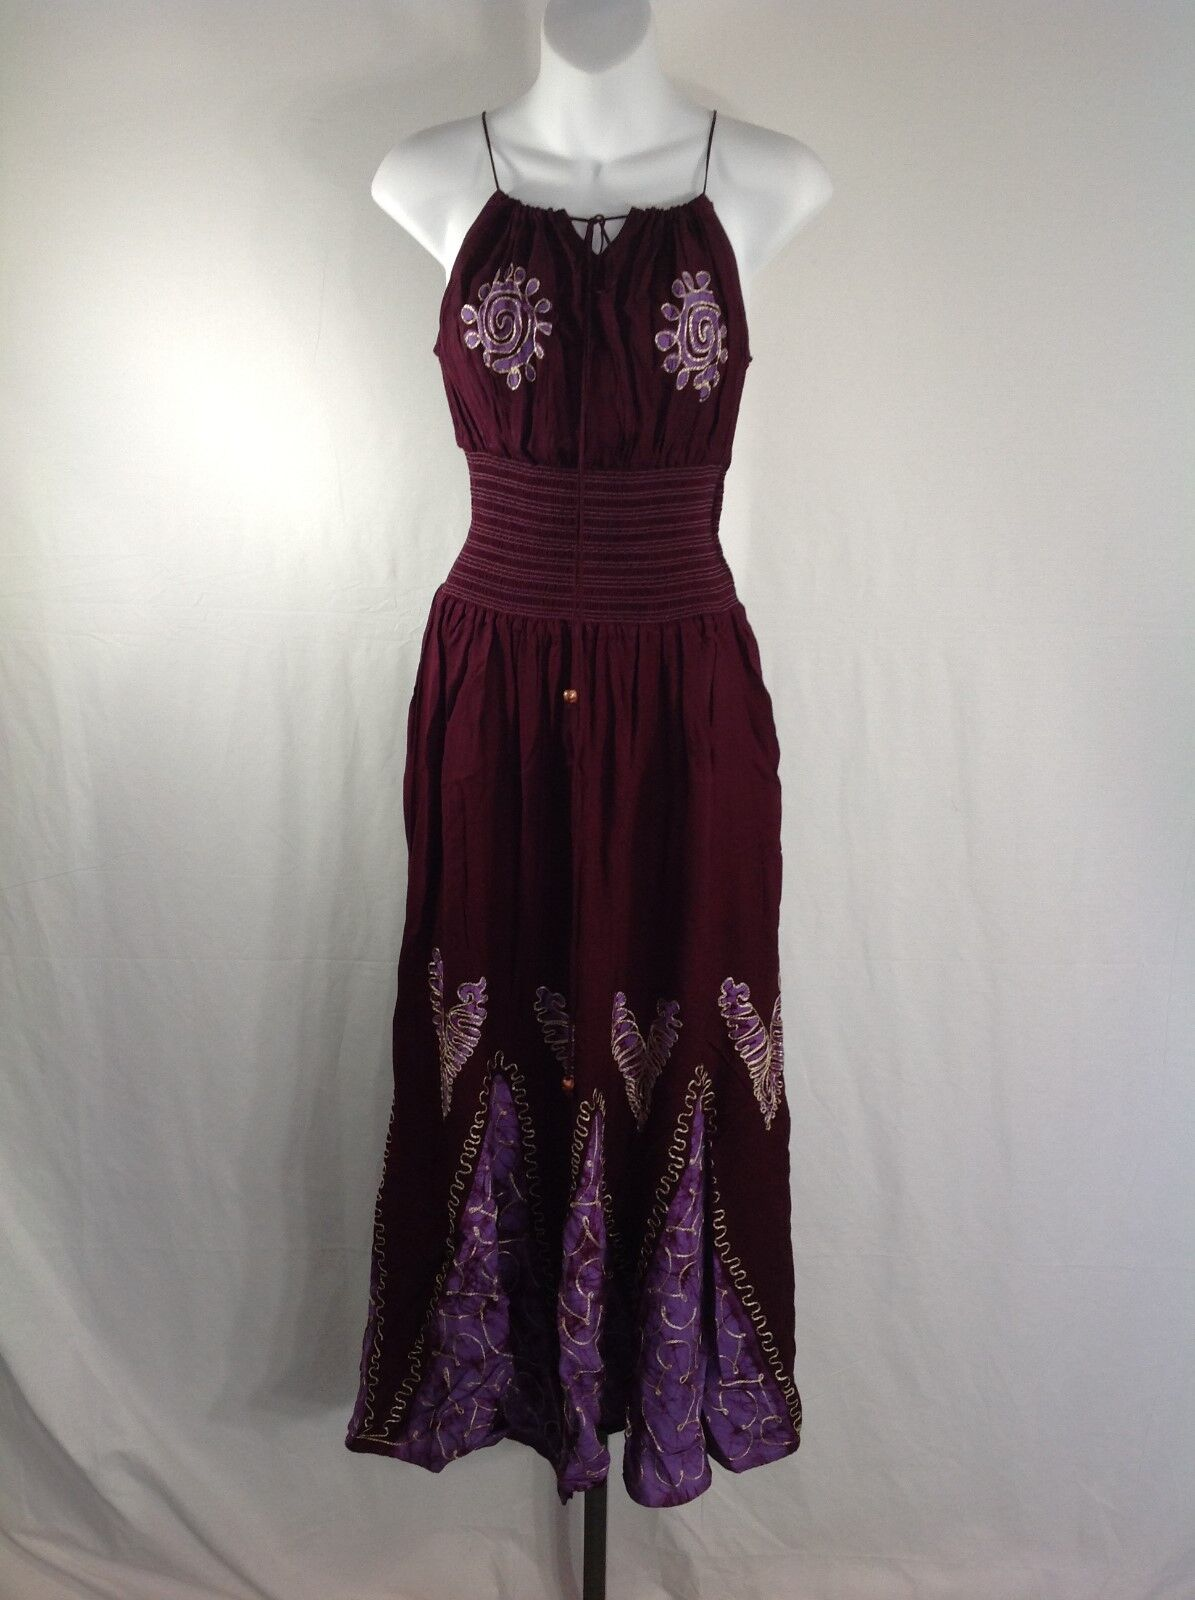 Maroon Purple Spaghetti Strap Dress One Size